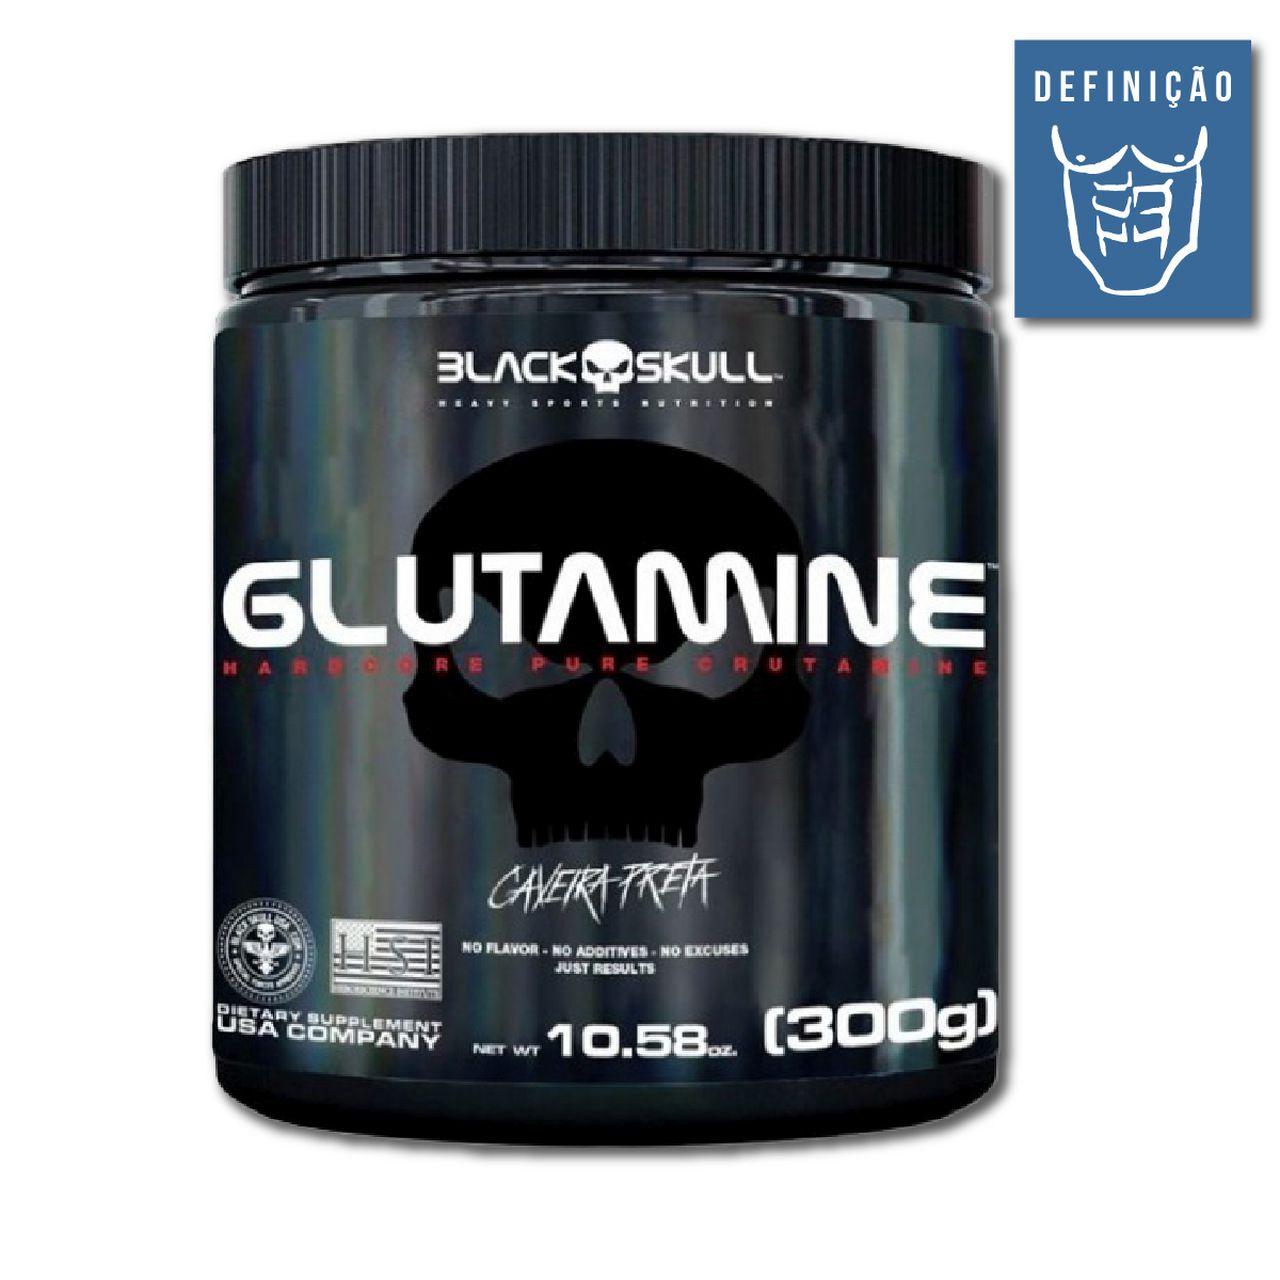 Glutamine 300g (Caveira Preta) - Black Skull